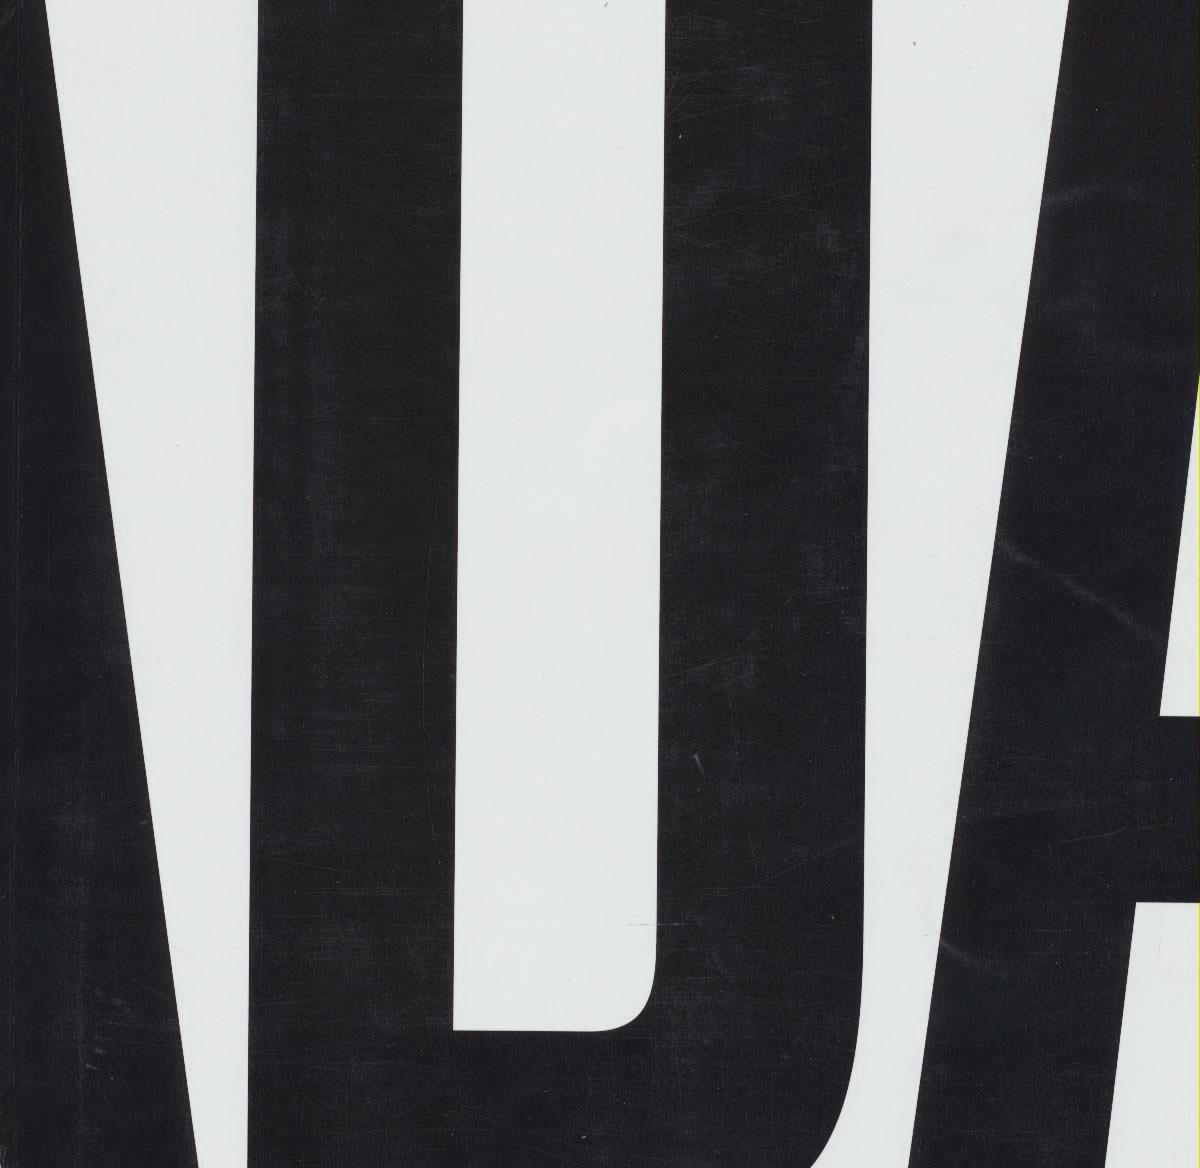 Catalogue-de-l-exposition-Dada-2005-centre-pompidou-cover-bibliotheque-index-grafik